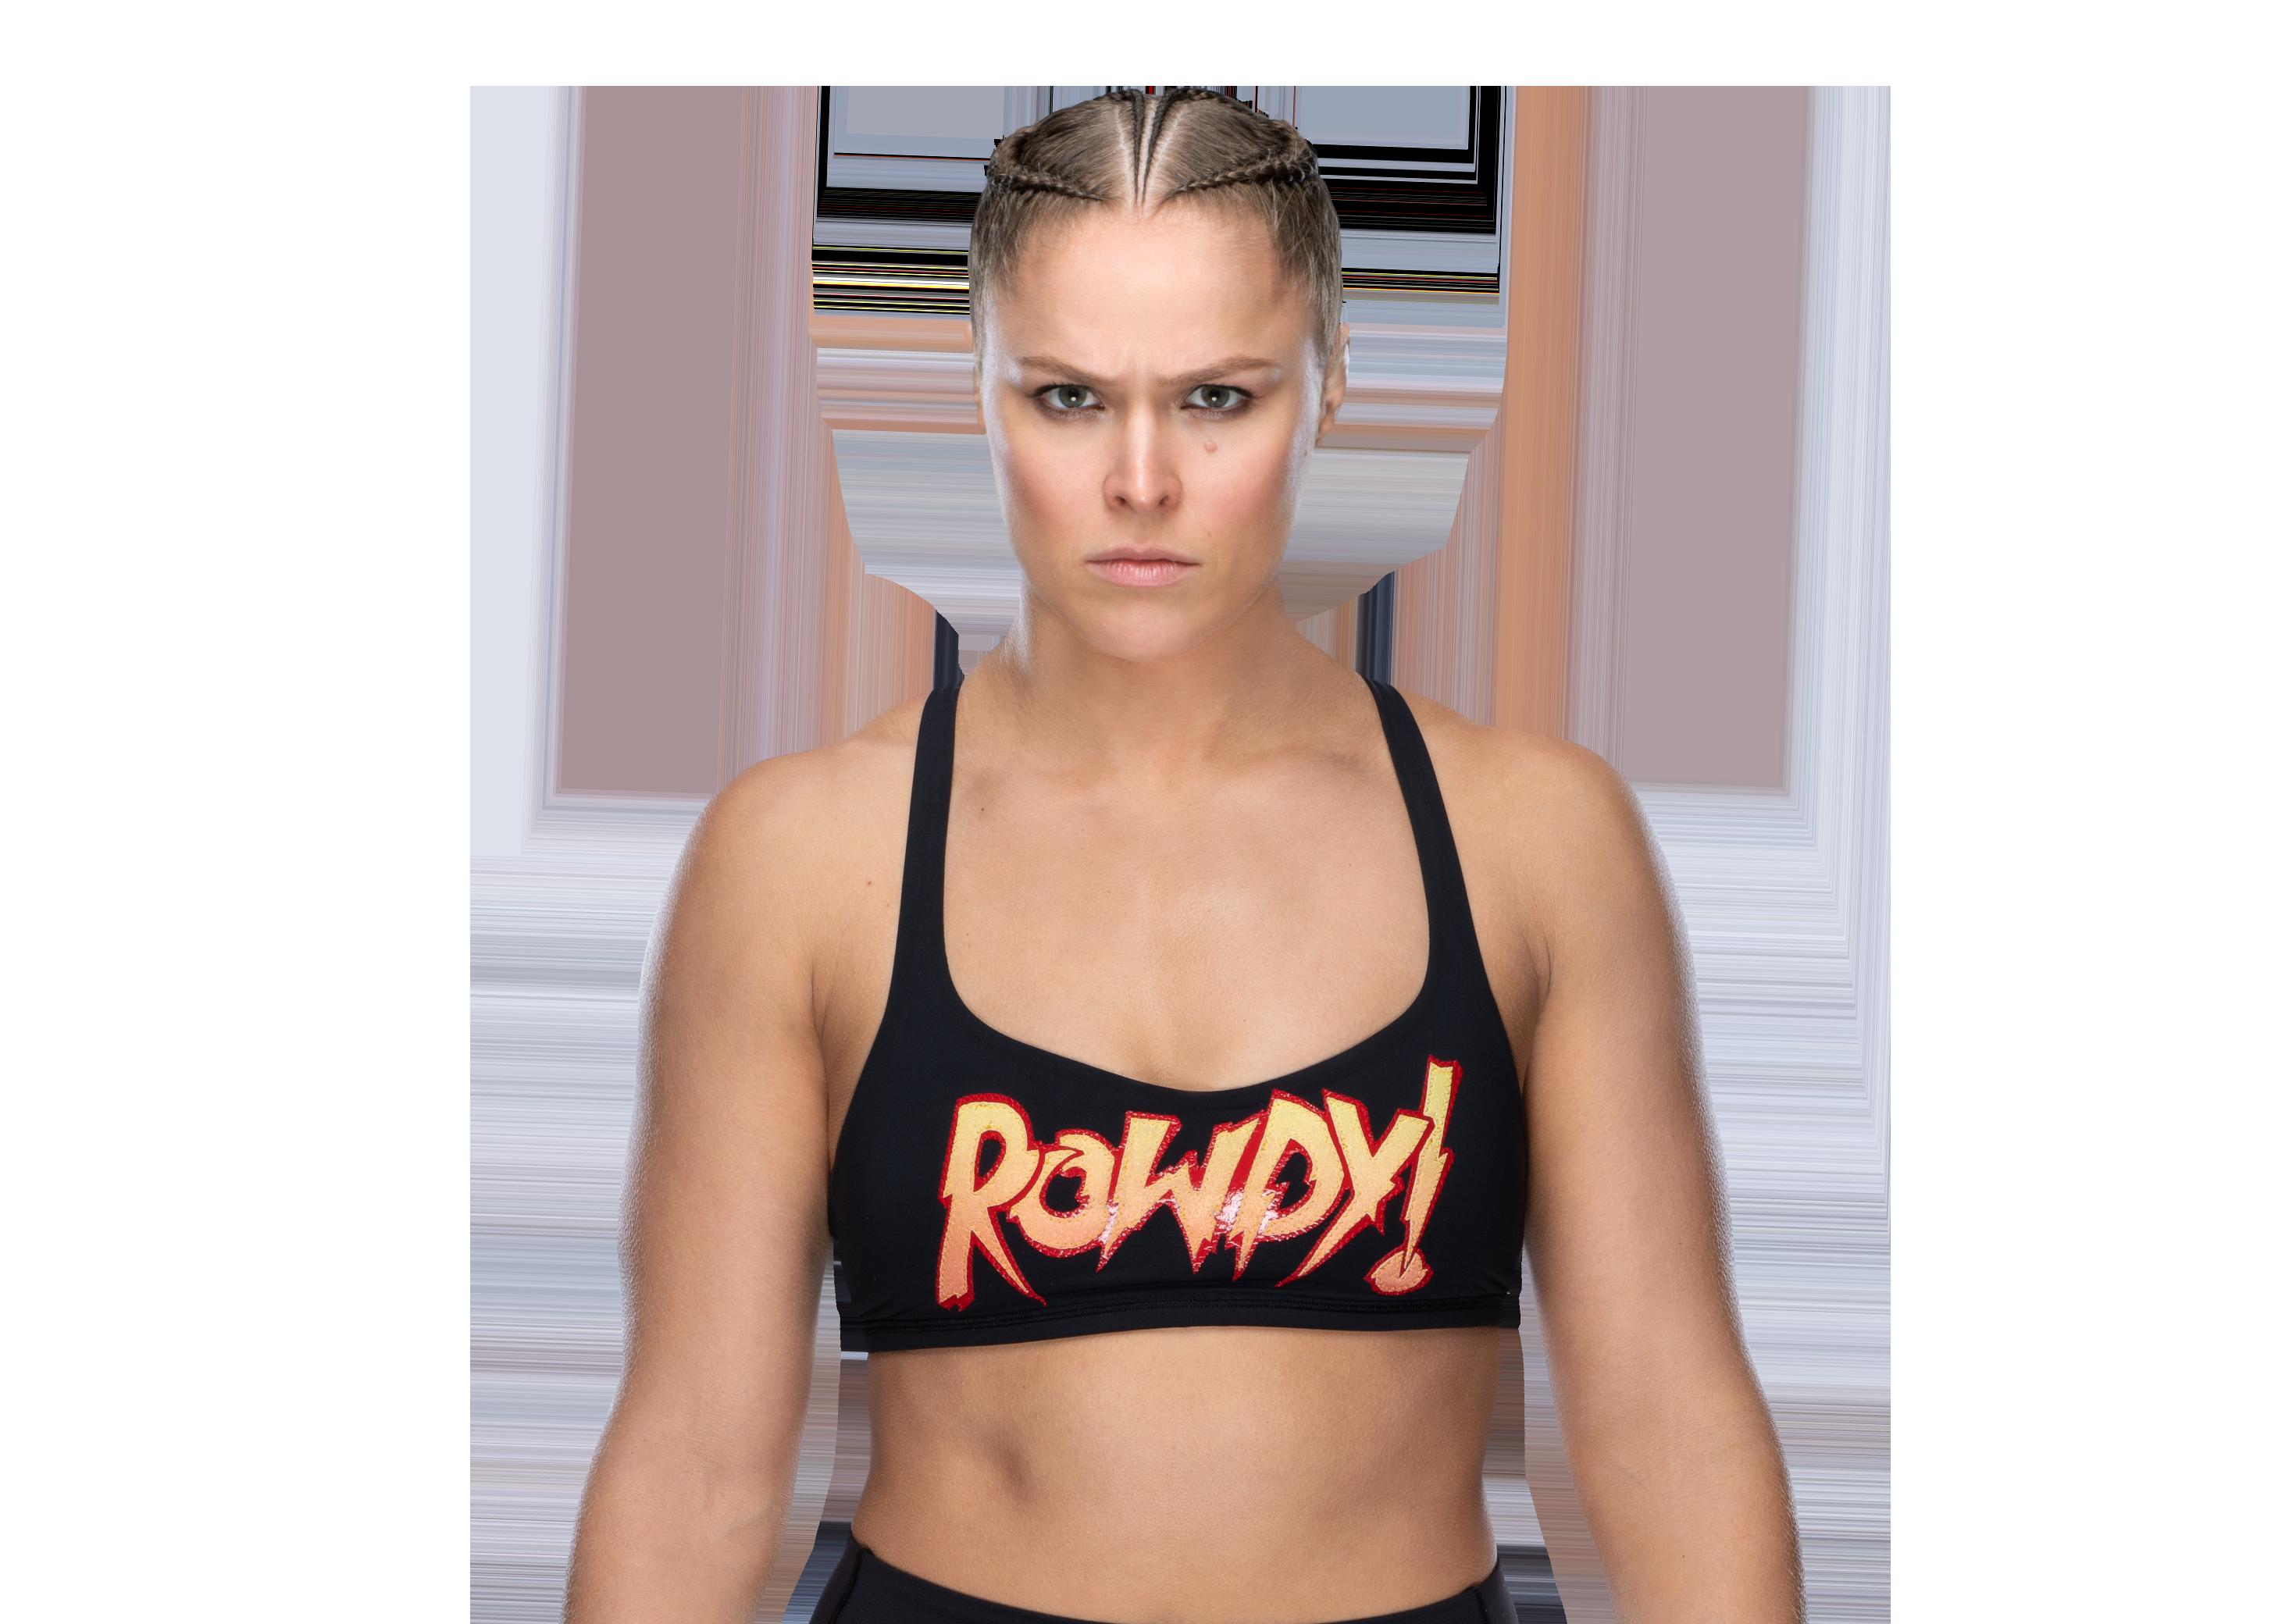 Ronda Rousey Ronda Rousey Wwe Ronda Rousey Ronda Jean Rousey